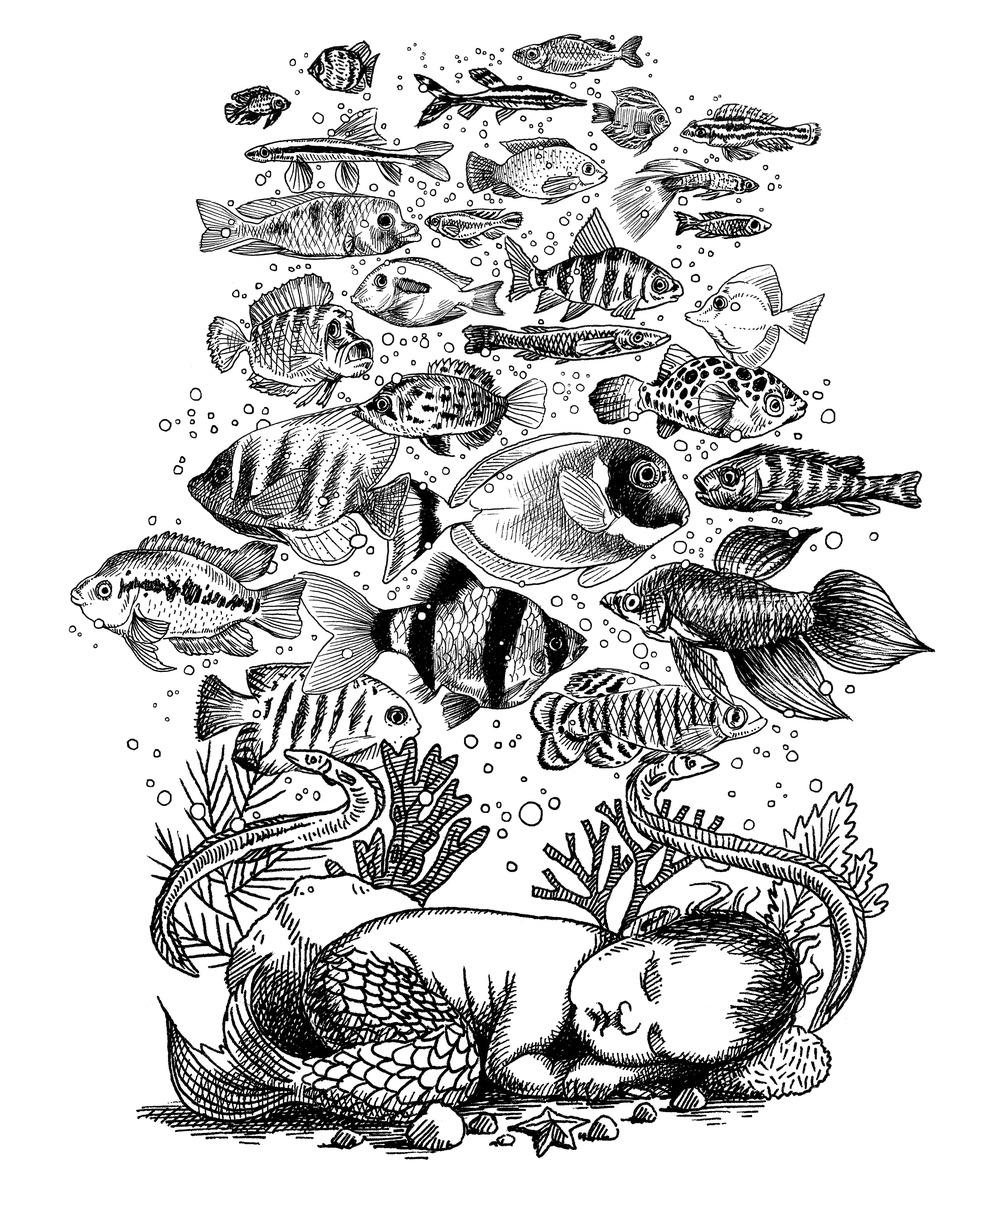 'The Deep'